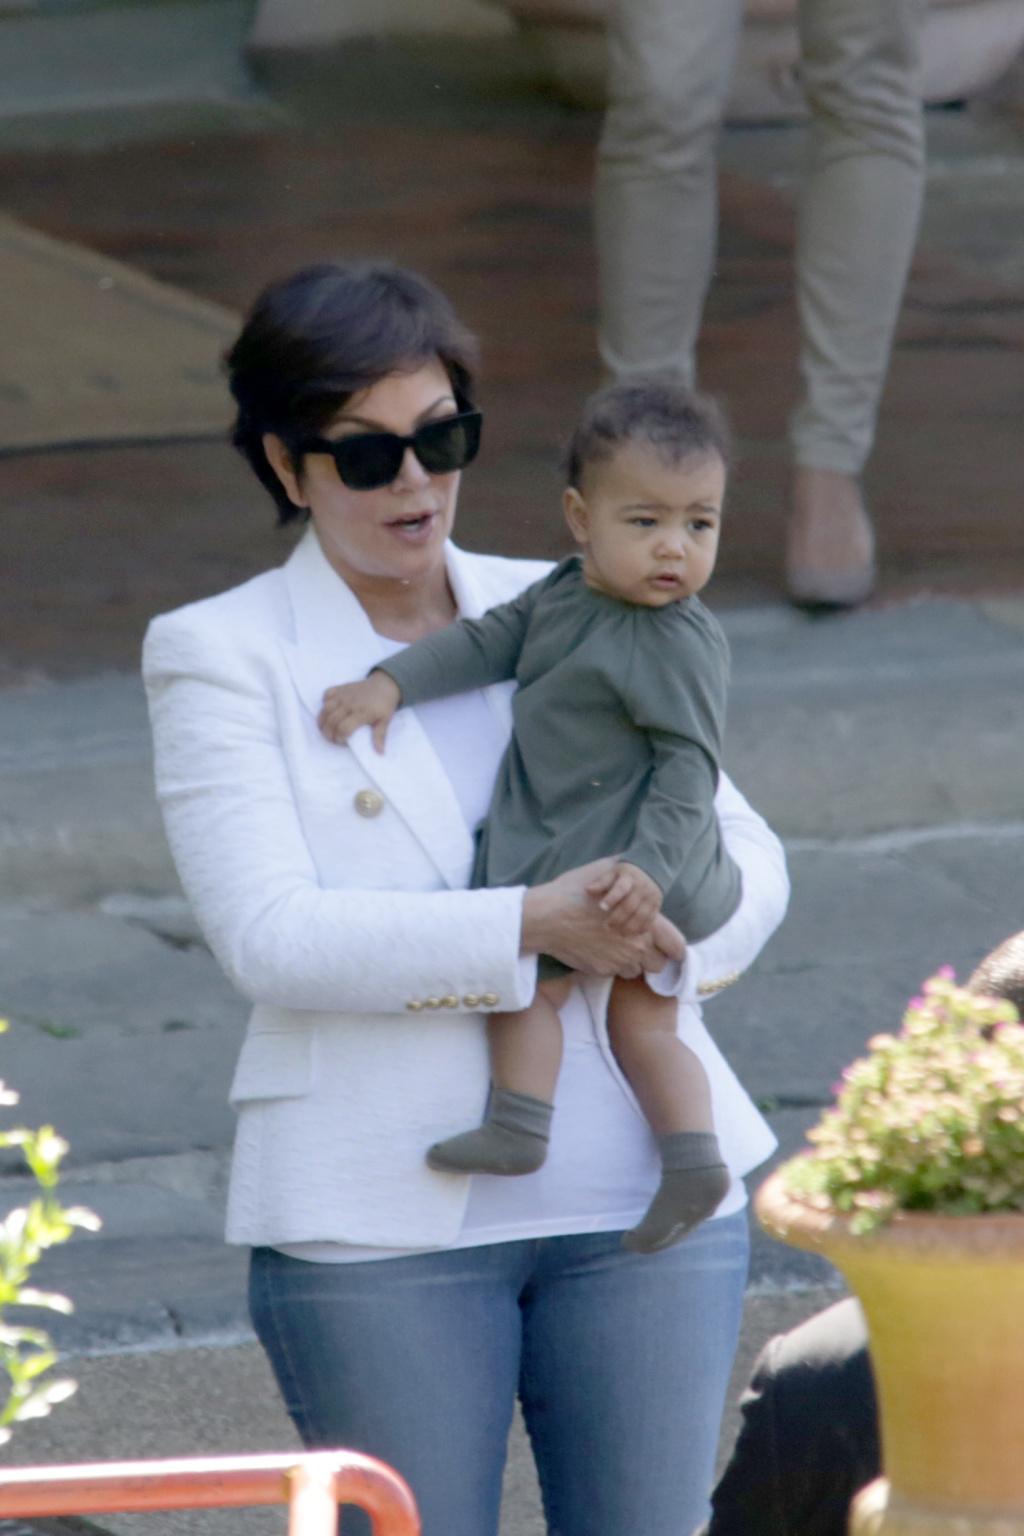 The Kardashian Family leaving Paris